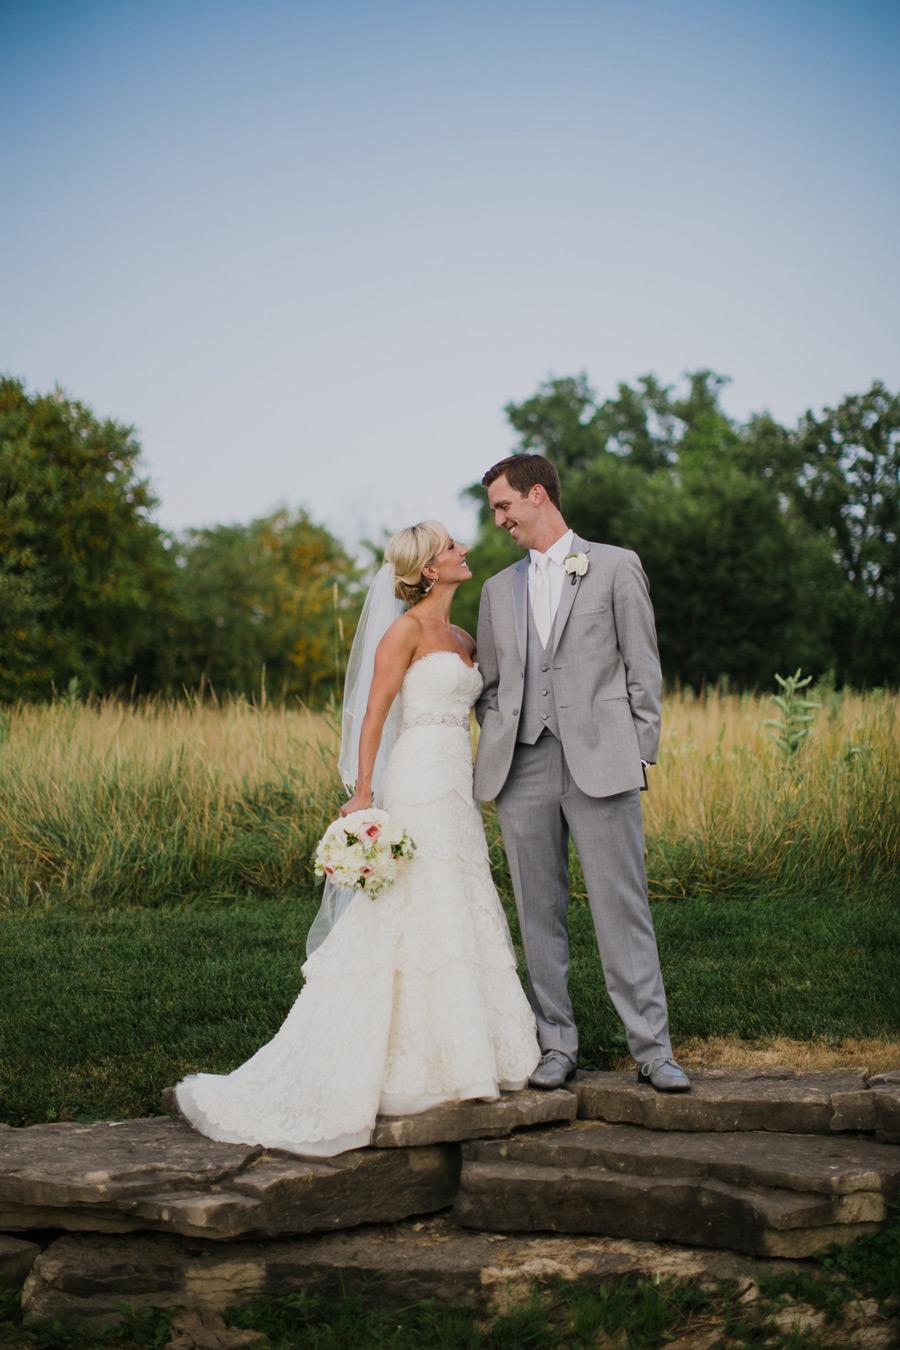 hyatt-lodge-oak-brook-wedding-033